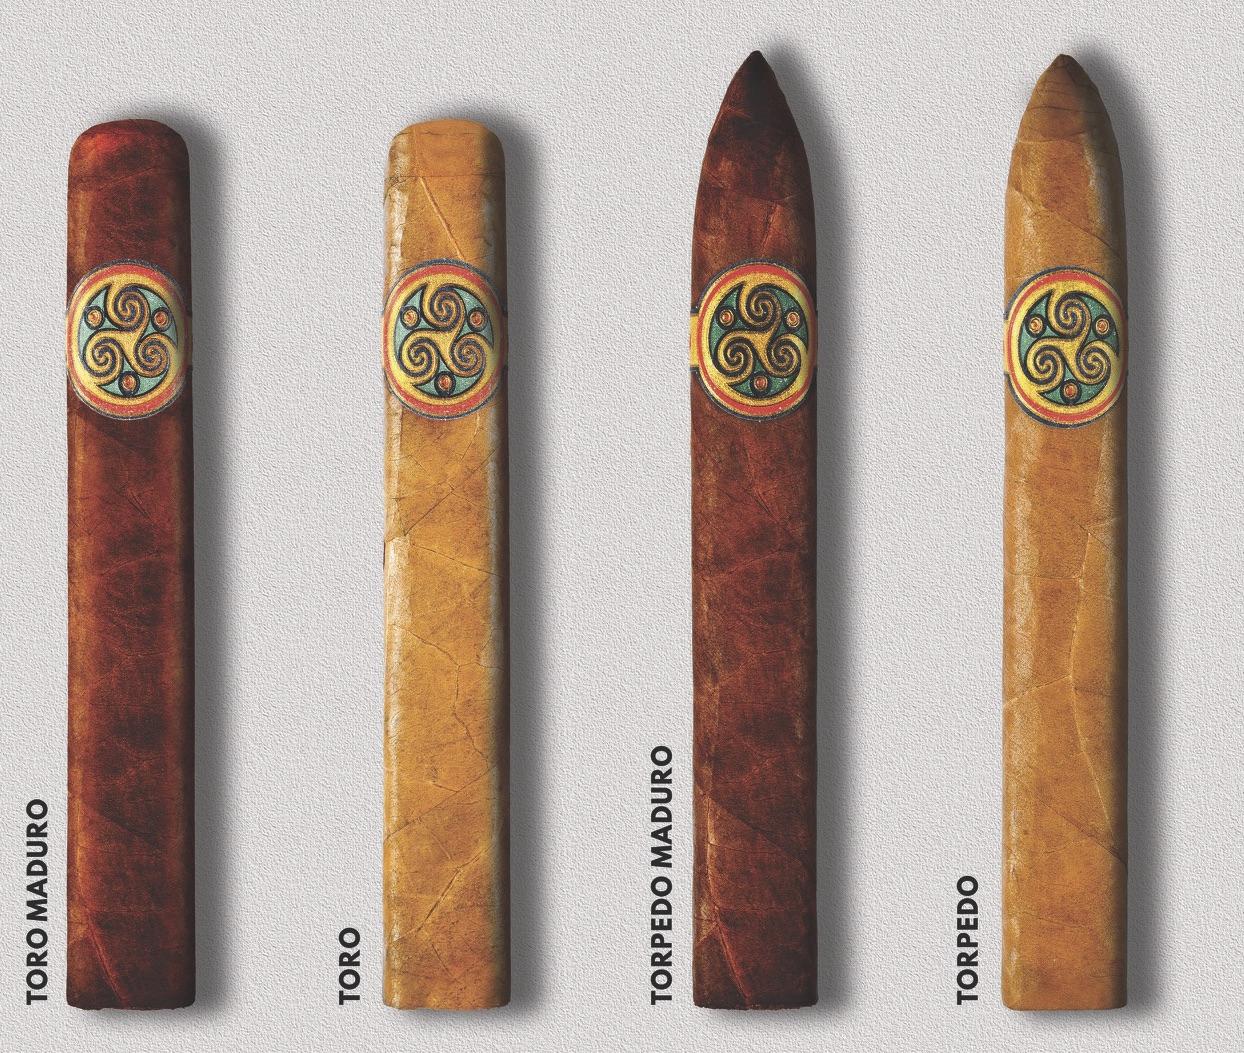 Cigar News: Bombay Tobak Releases Gaaja Torpedo and Gaaja Maduro